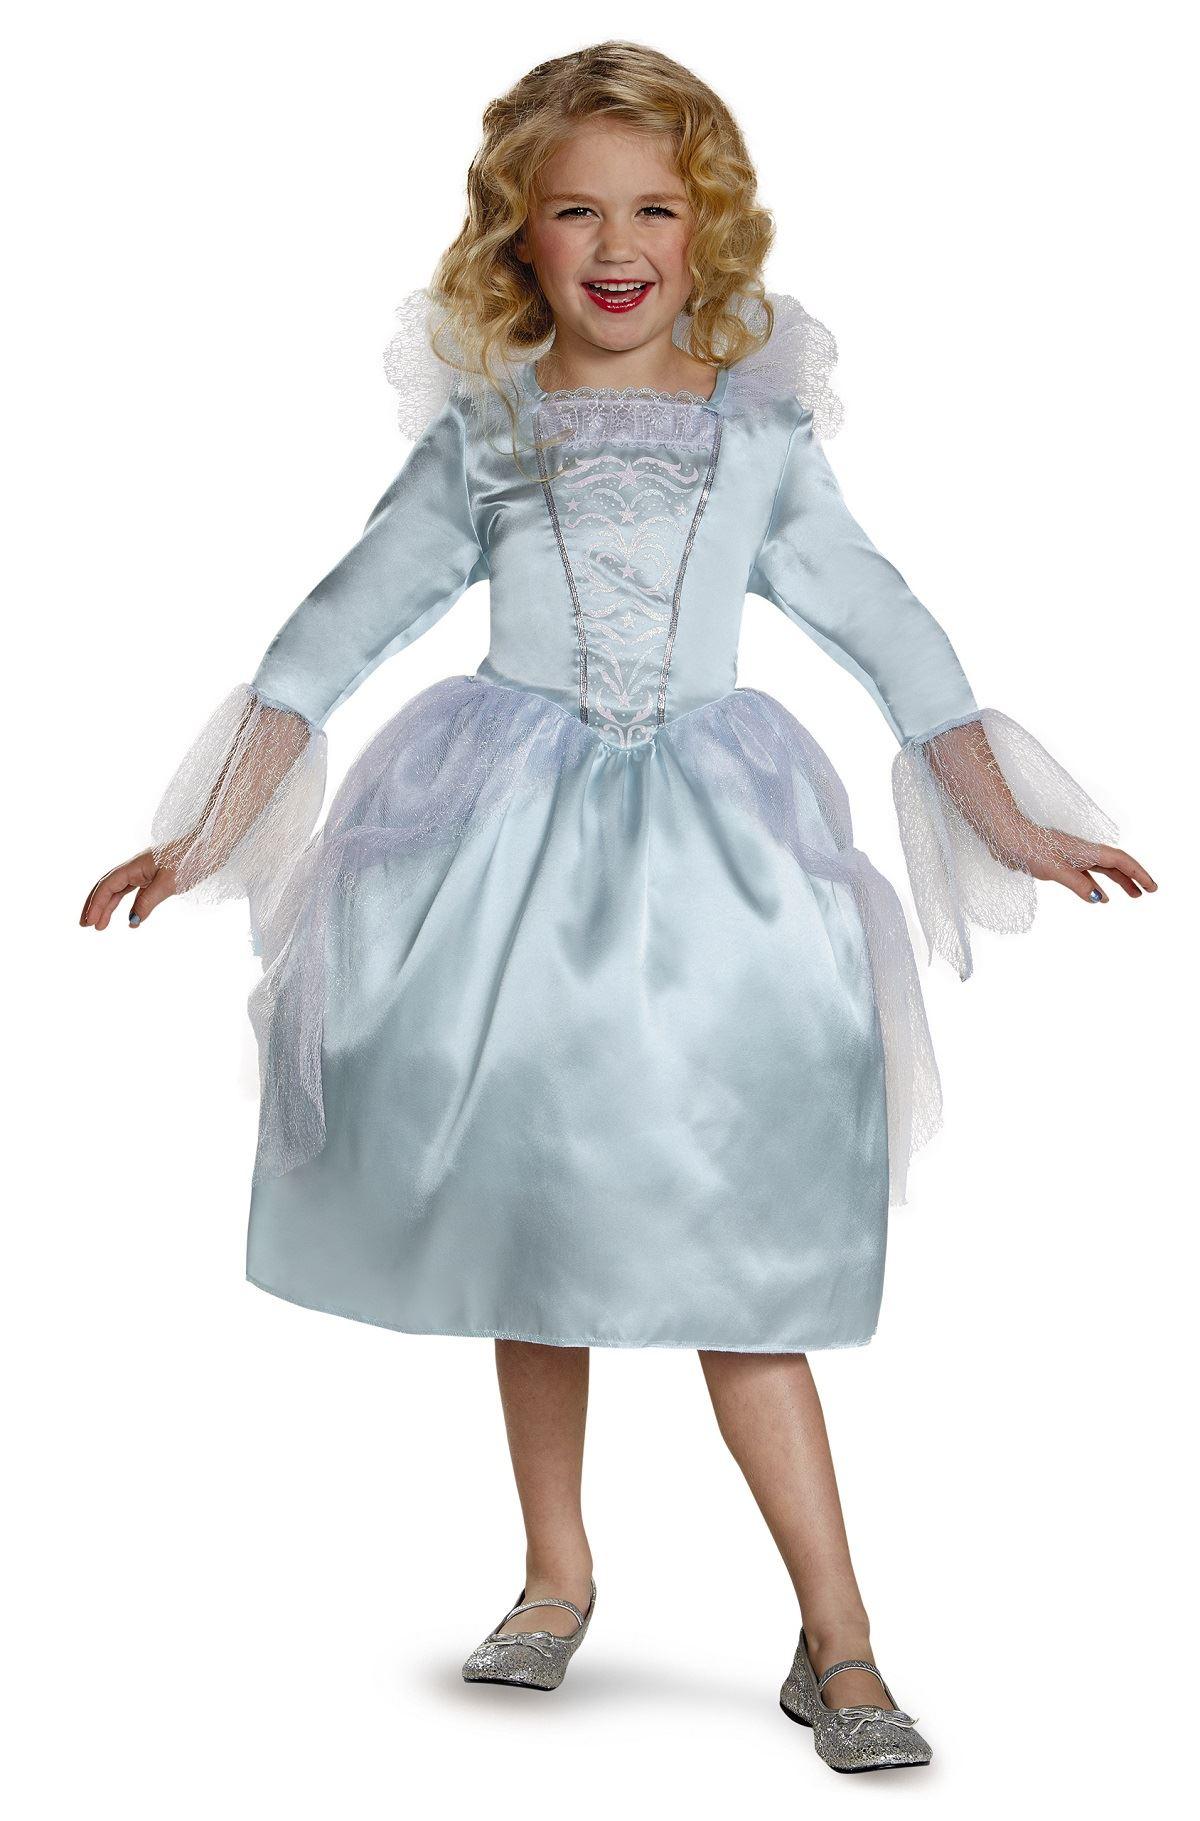 angel halloween costumes girls kids fairy godmother cinderella movie girls costume 26 99